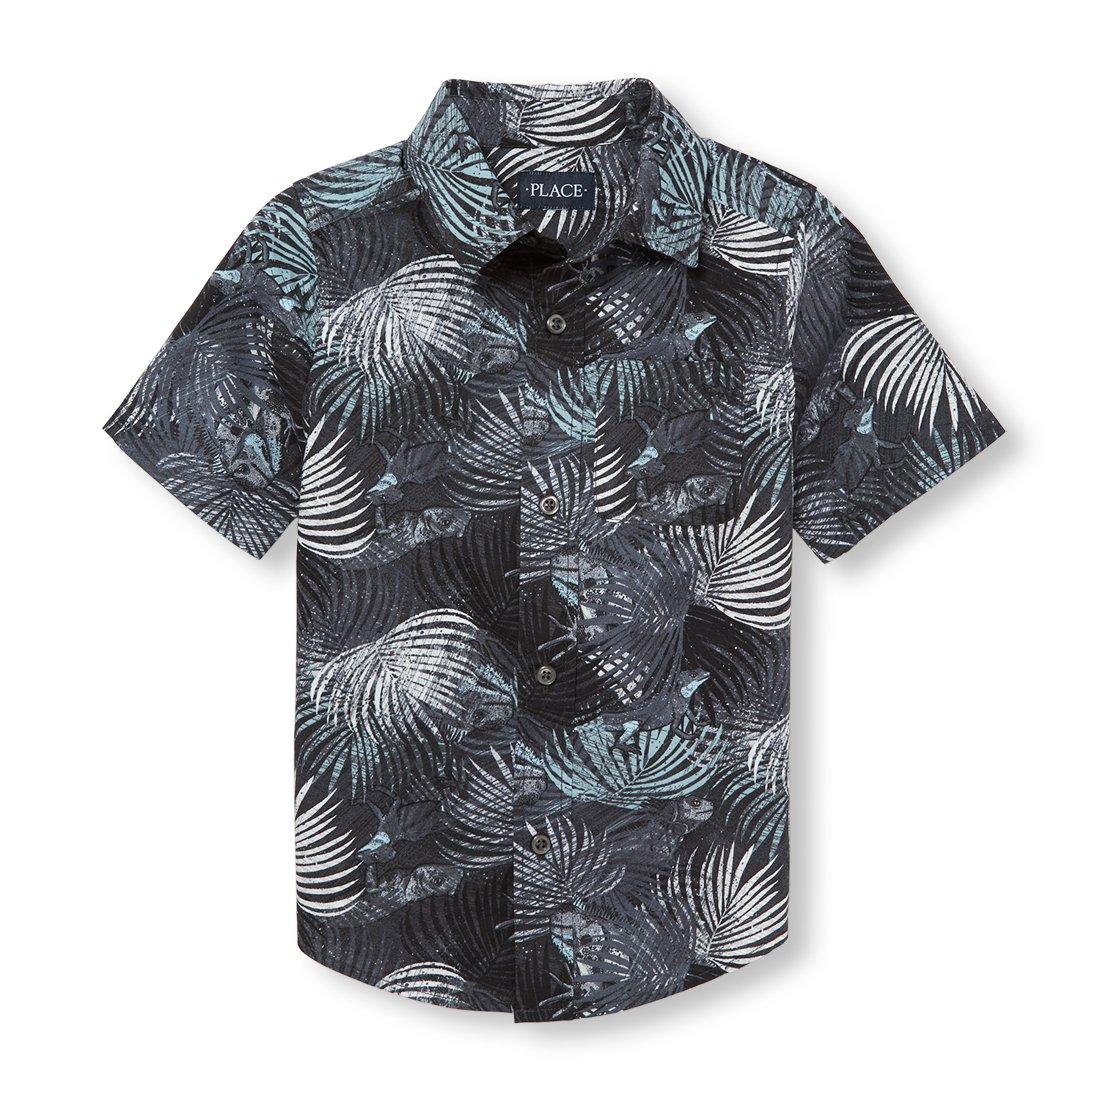 The Children's Place Big Boys' Short Sleeve Button-up Shirt, Gray Steel 02428, XS (4)